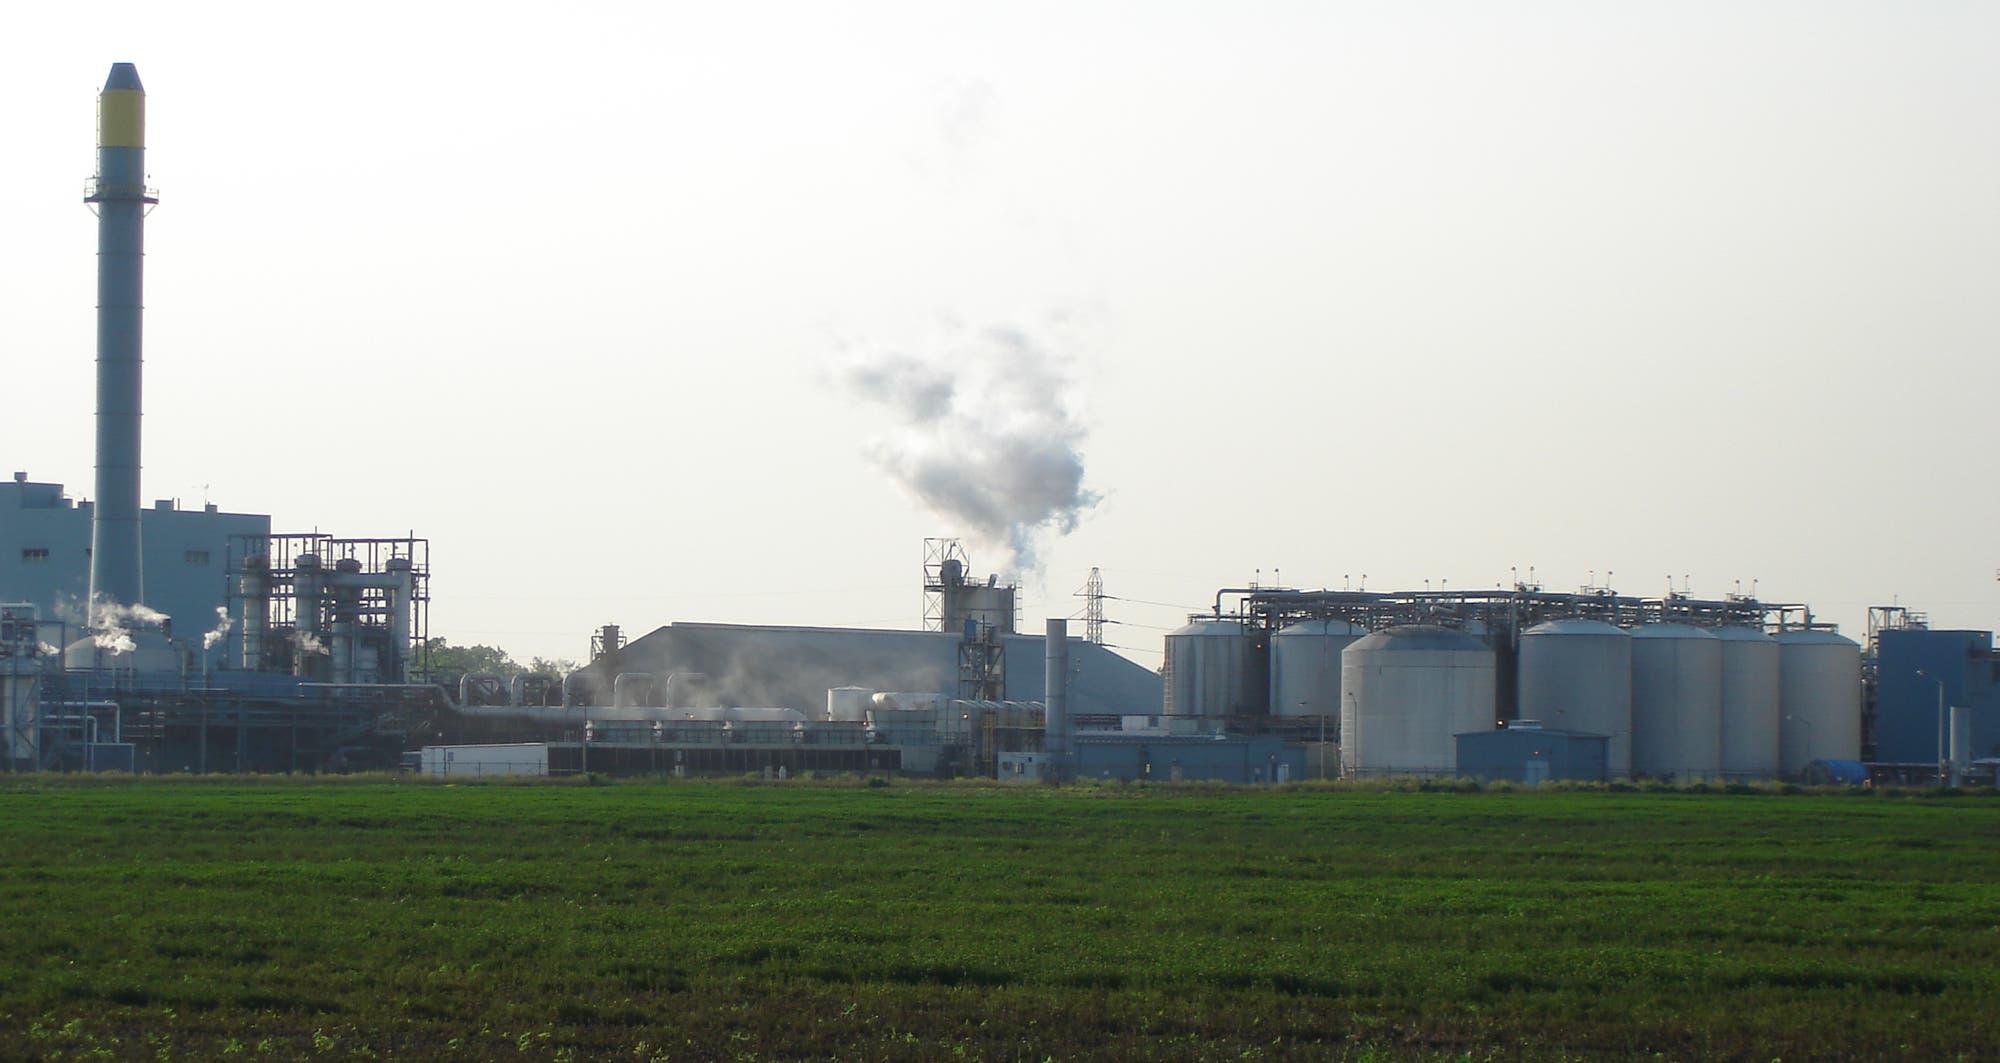 Ethanol-Produktion in den USA